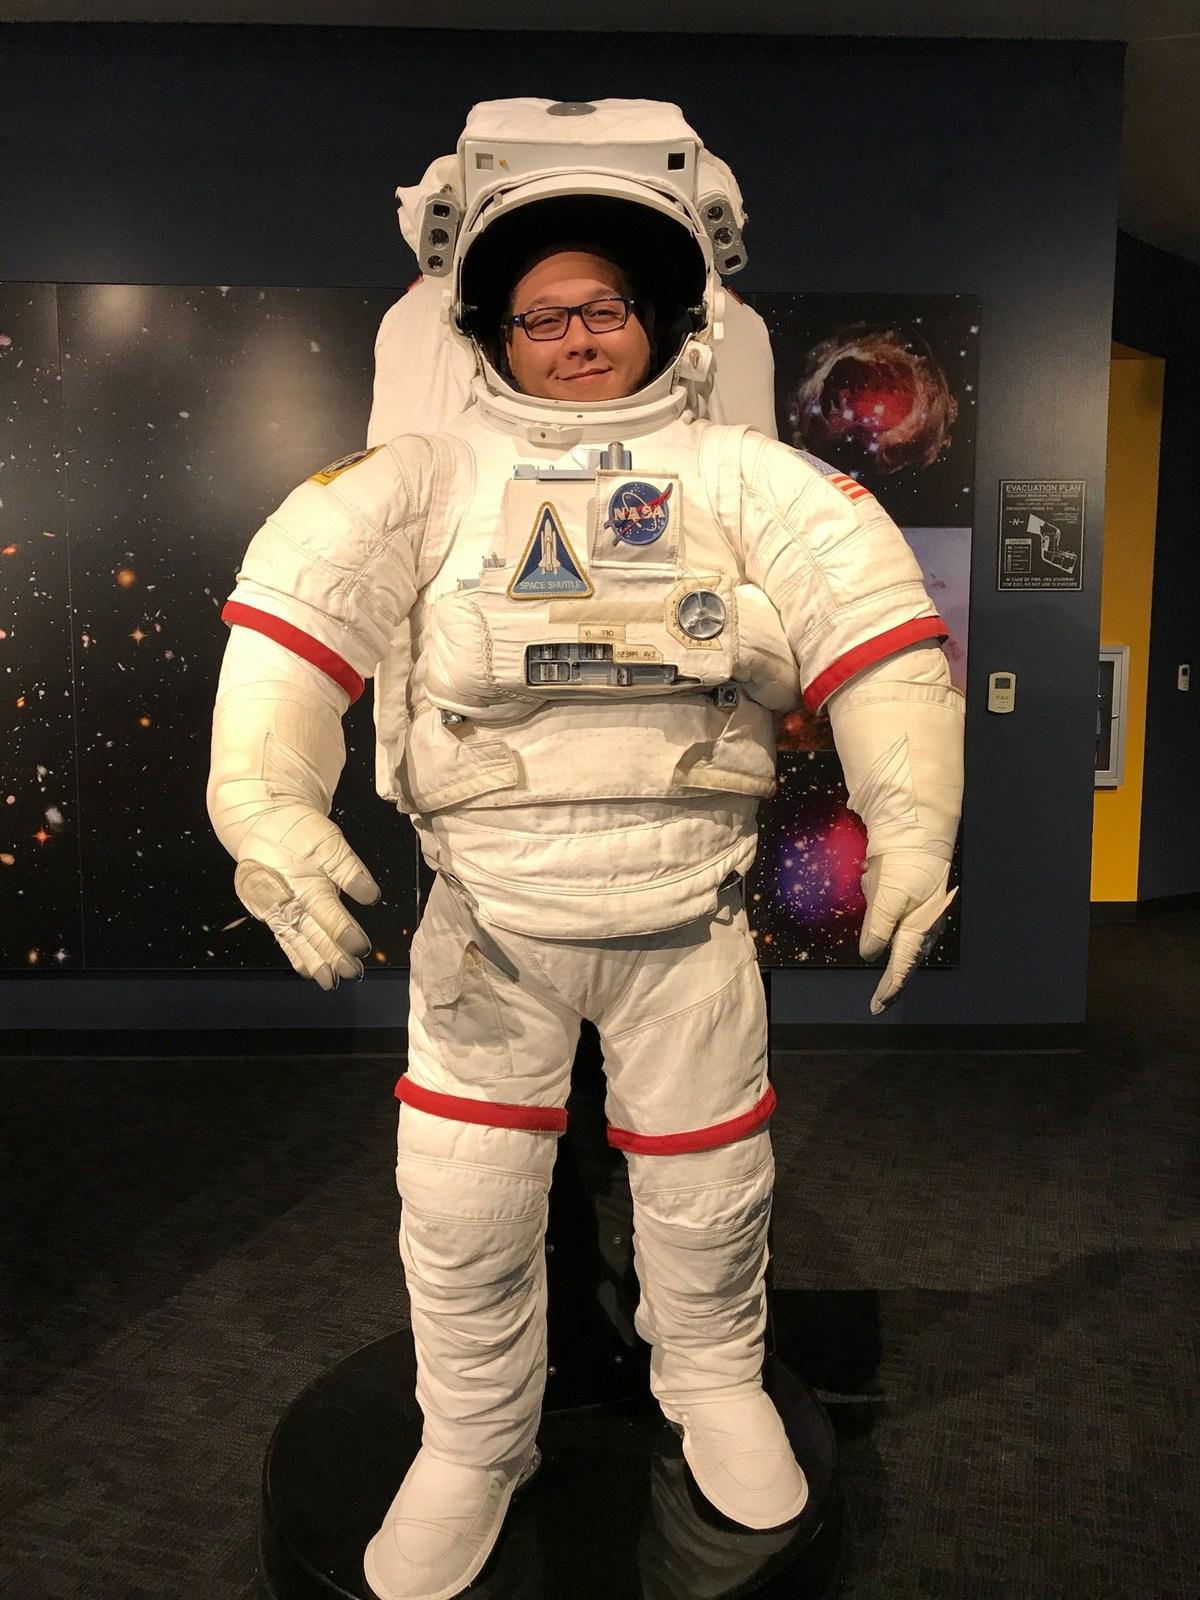 martin as an astronaut